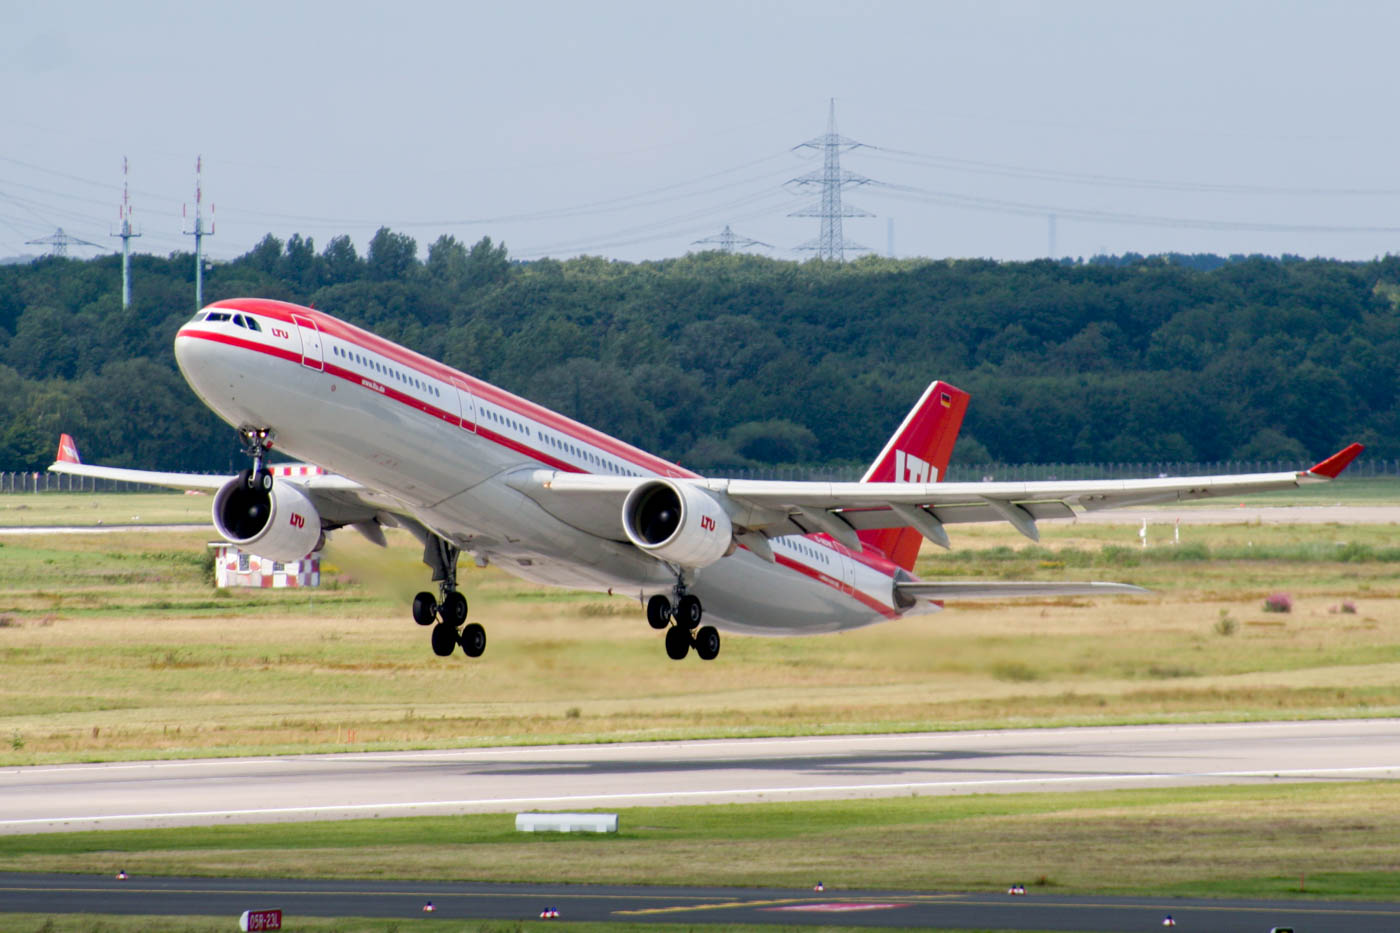 LTU Airbus A330-300 Departing Dusseldorf